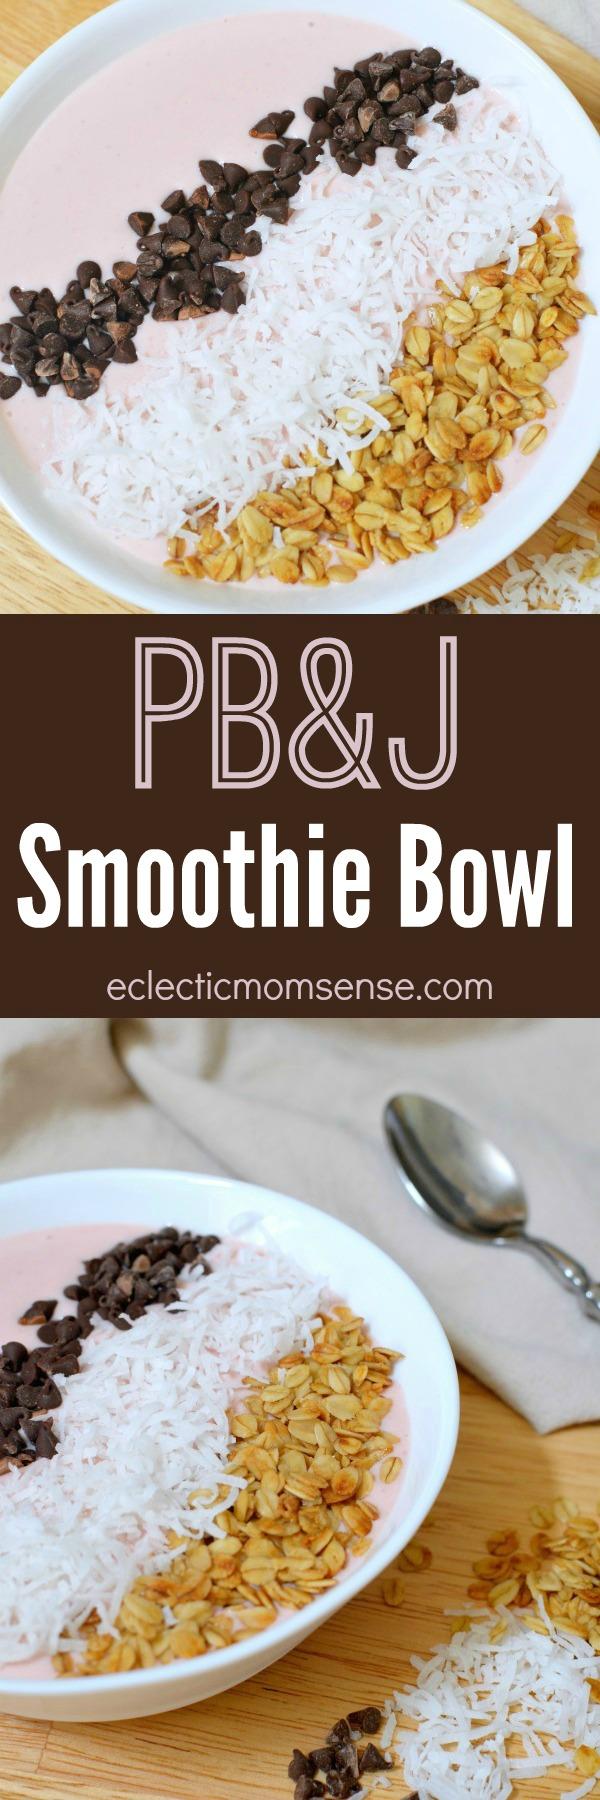 PB&J Smoothie Bowl